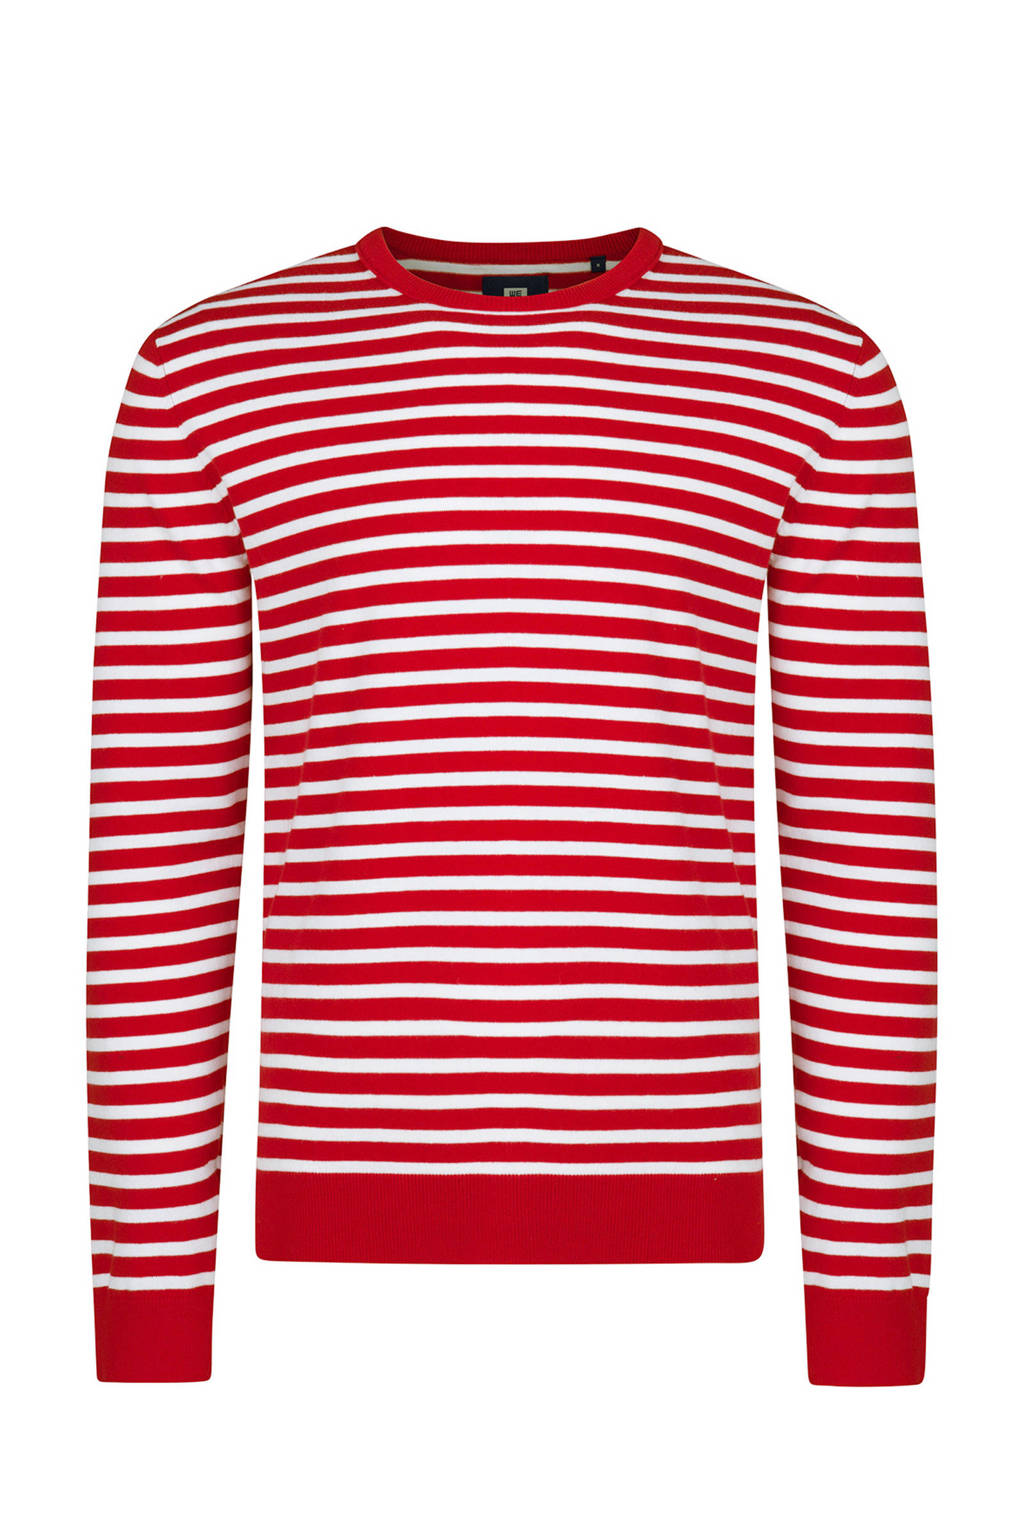 WE Fashion sweater, Chilli Red